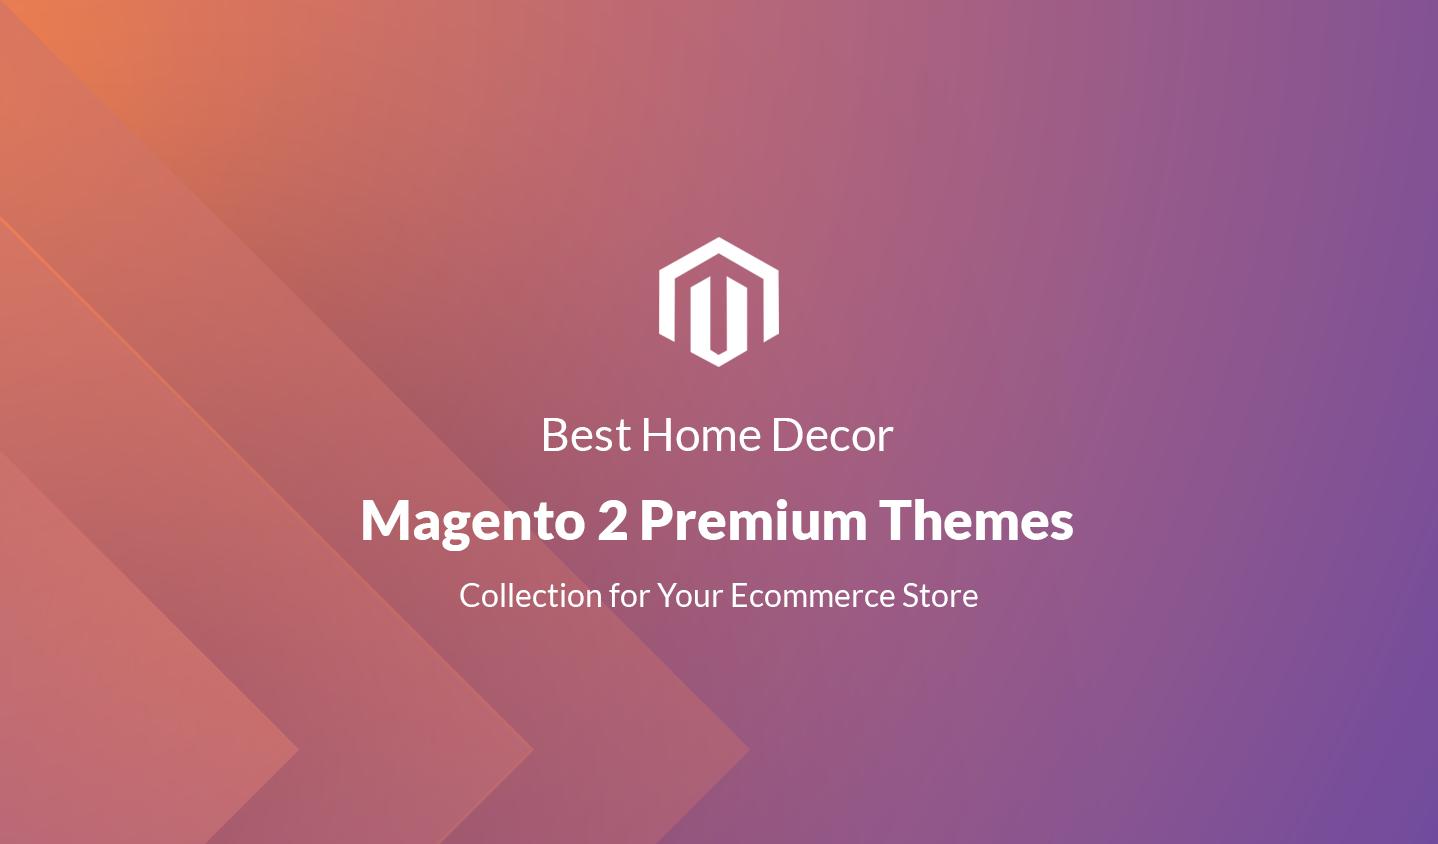 Best Home Decor Magento 2 Premium Themes